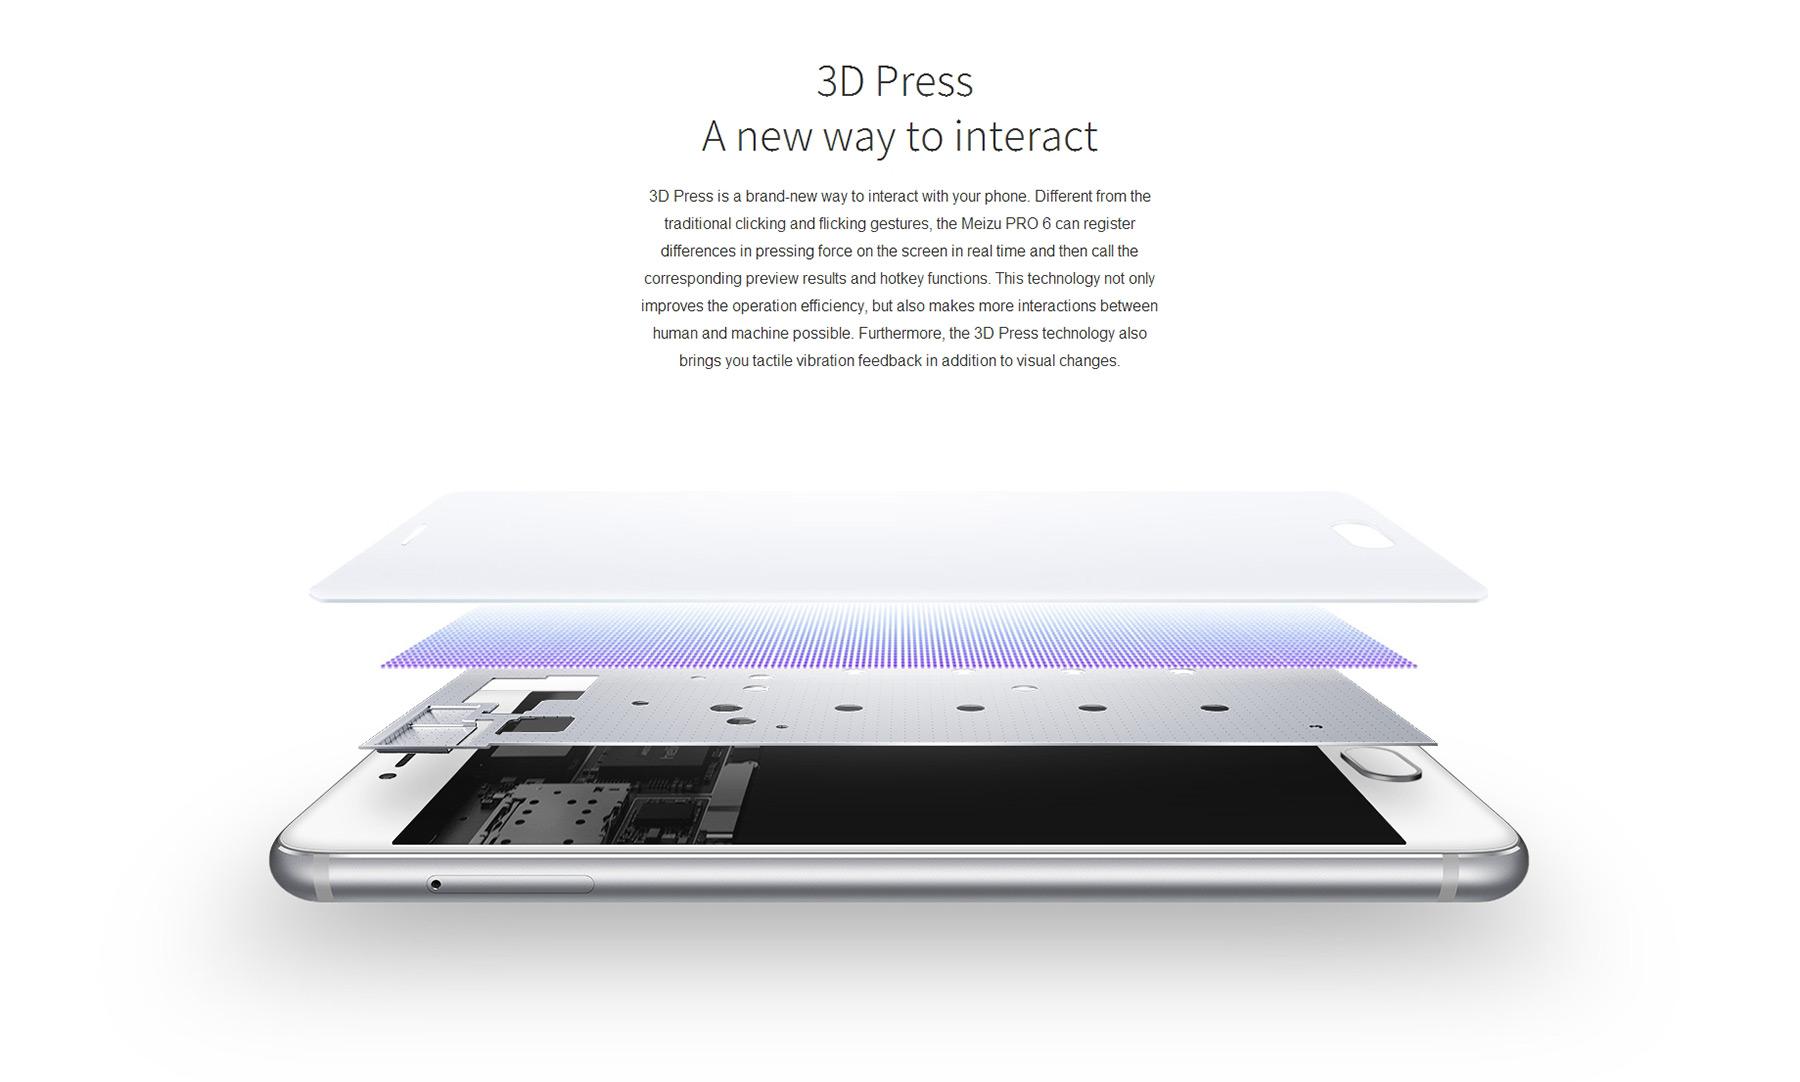 Meizu PRO 6, Antutu, Helio x25, 3d Press, China Smartphone, Neuheit, Preisvergleich, bester Preis kaufen